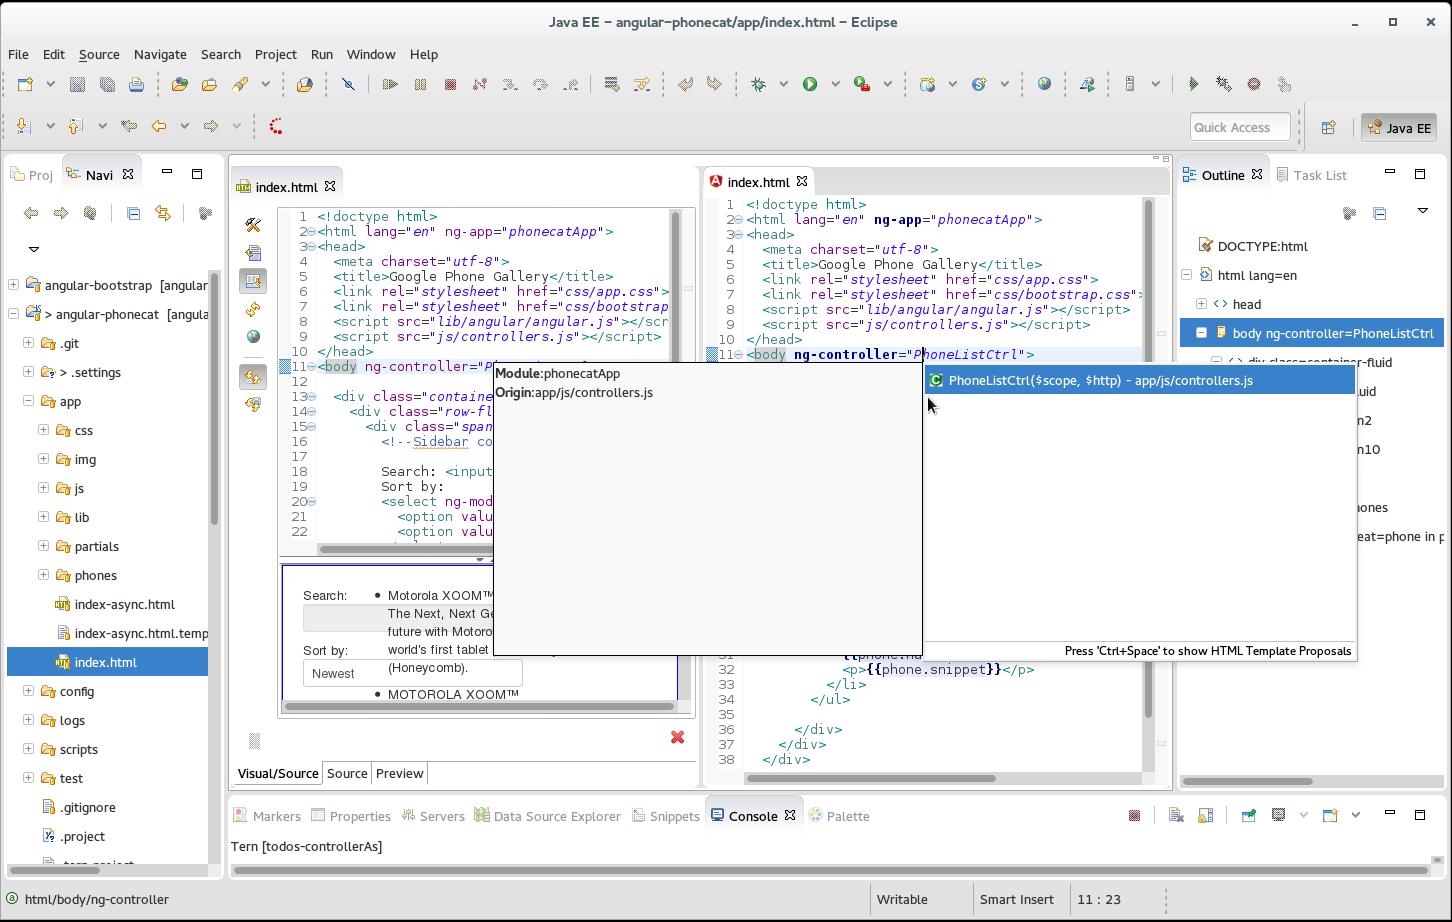 JBIDE-17676] Angular Code Assist doesn't work for angular phonecat